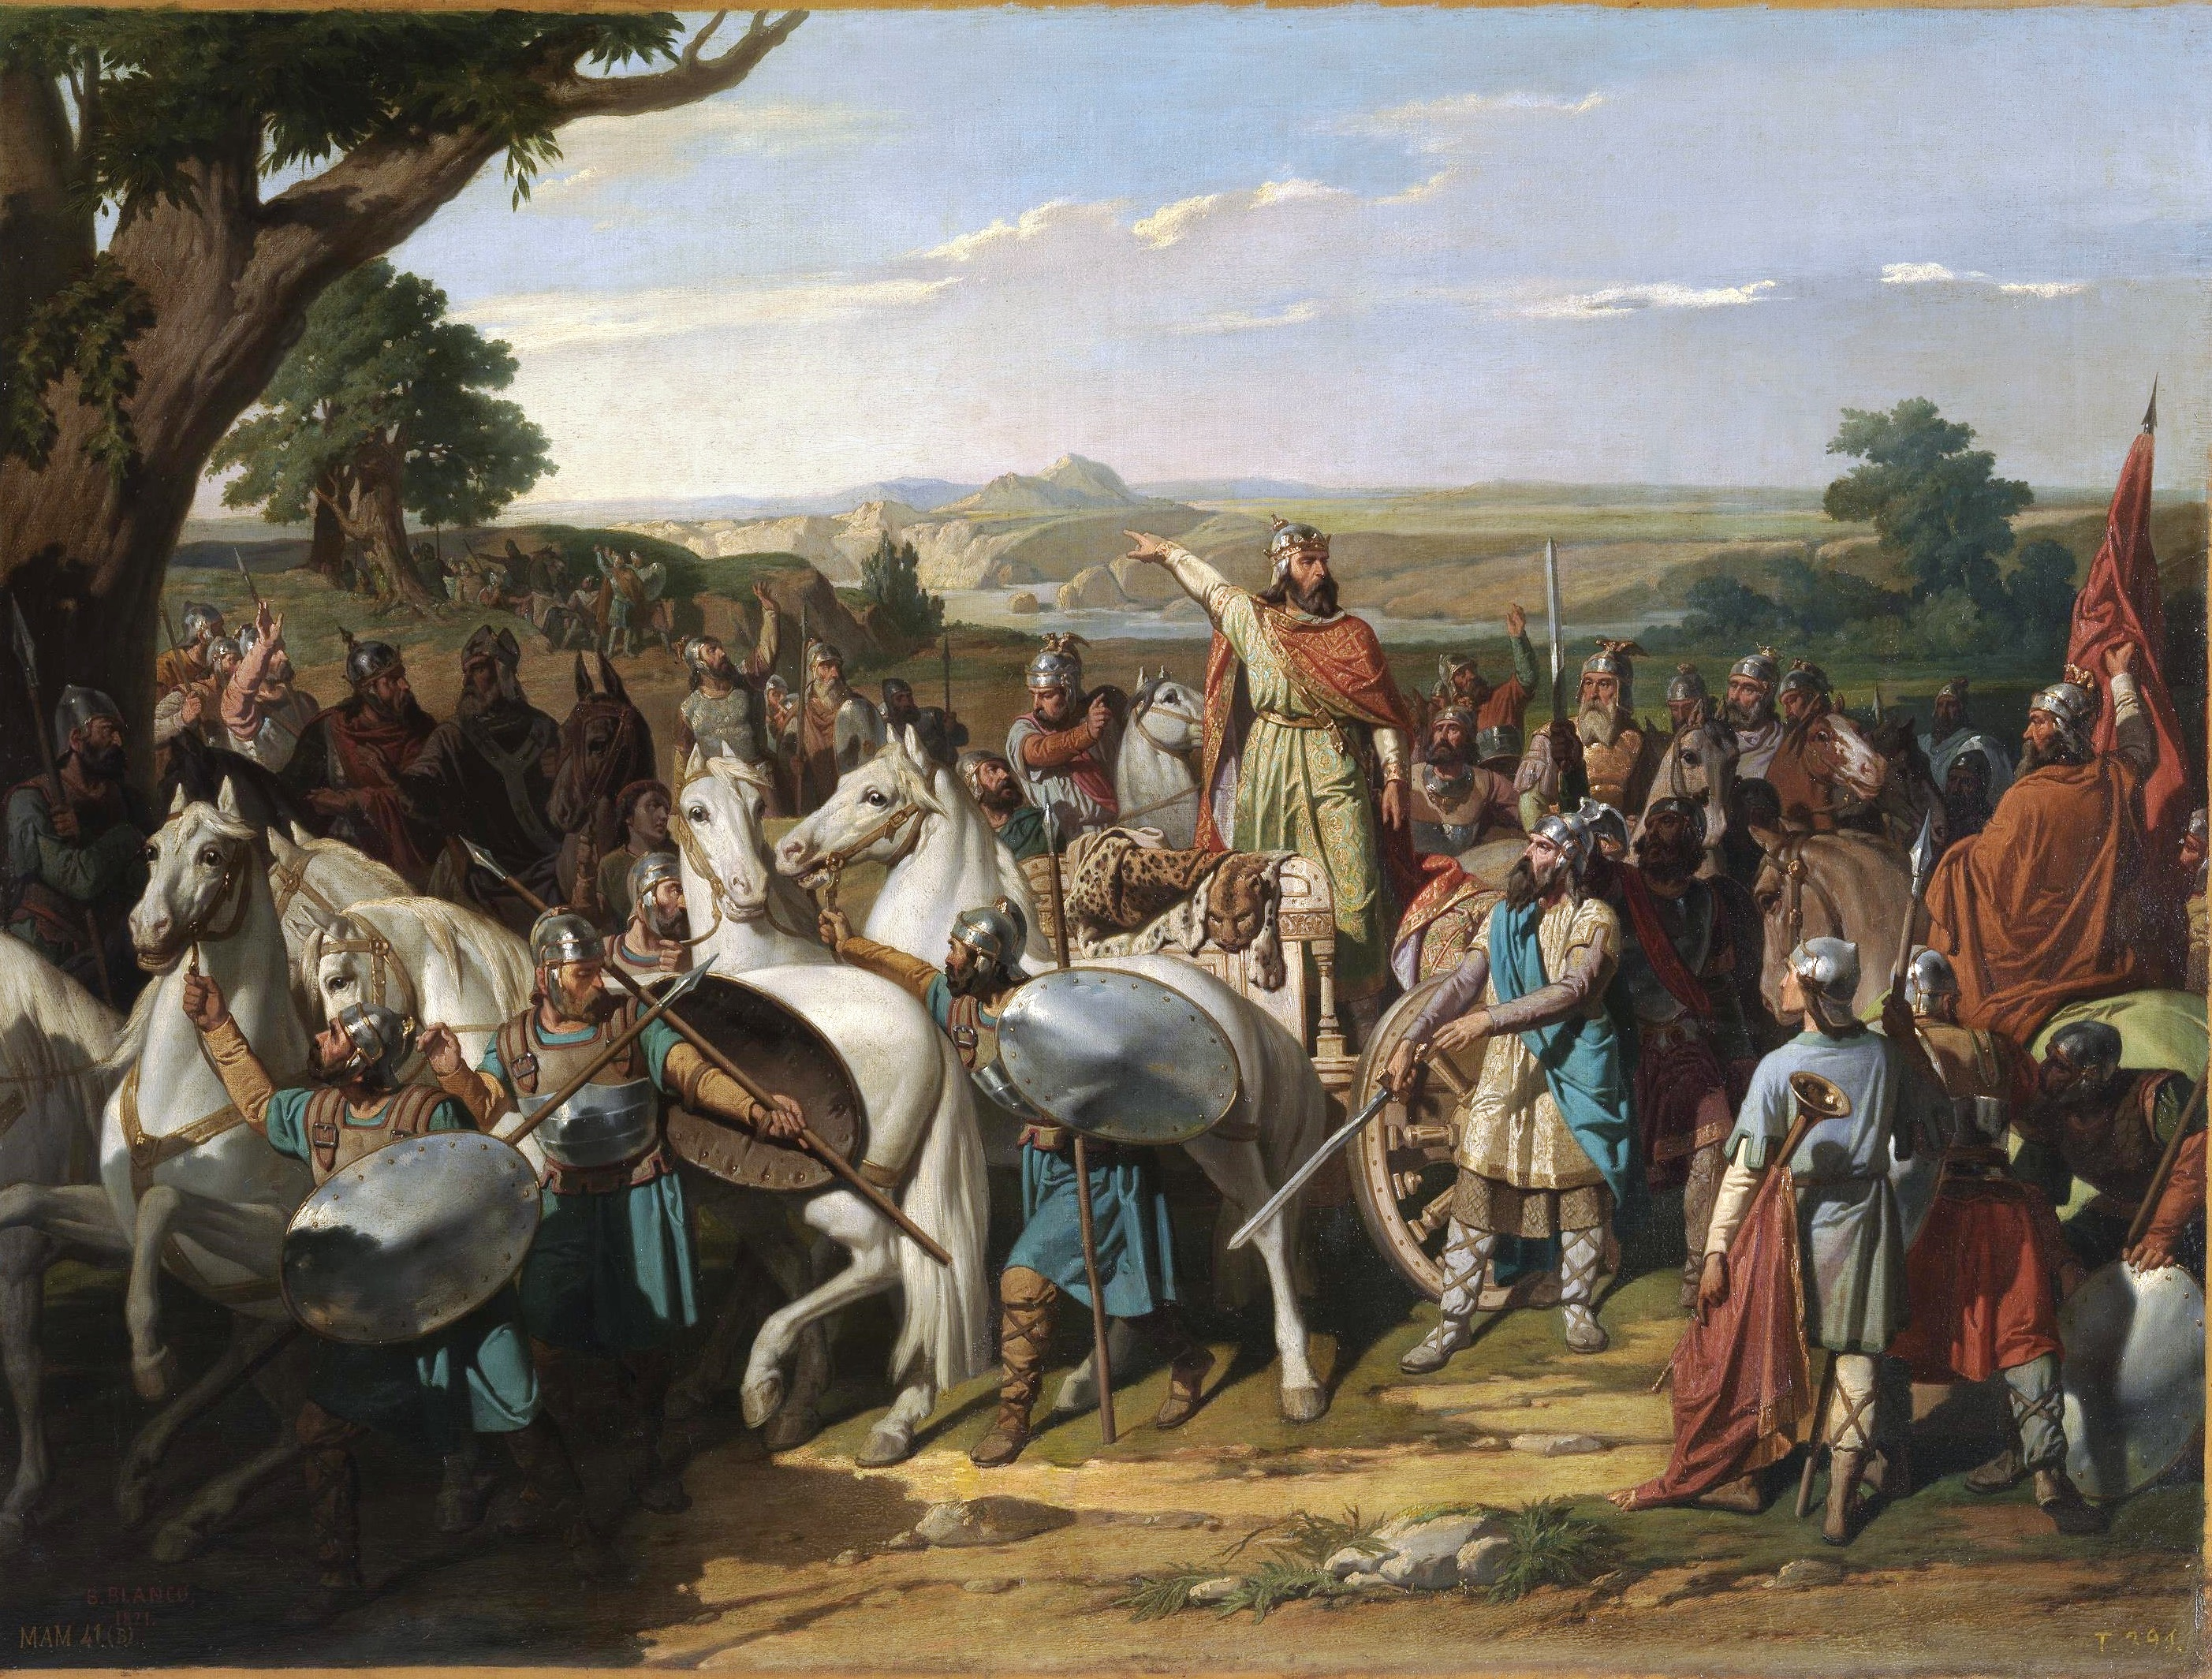 Batalla de Guadalete - Wikipedia, la enciclopedia libre